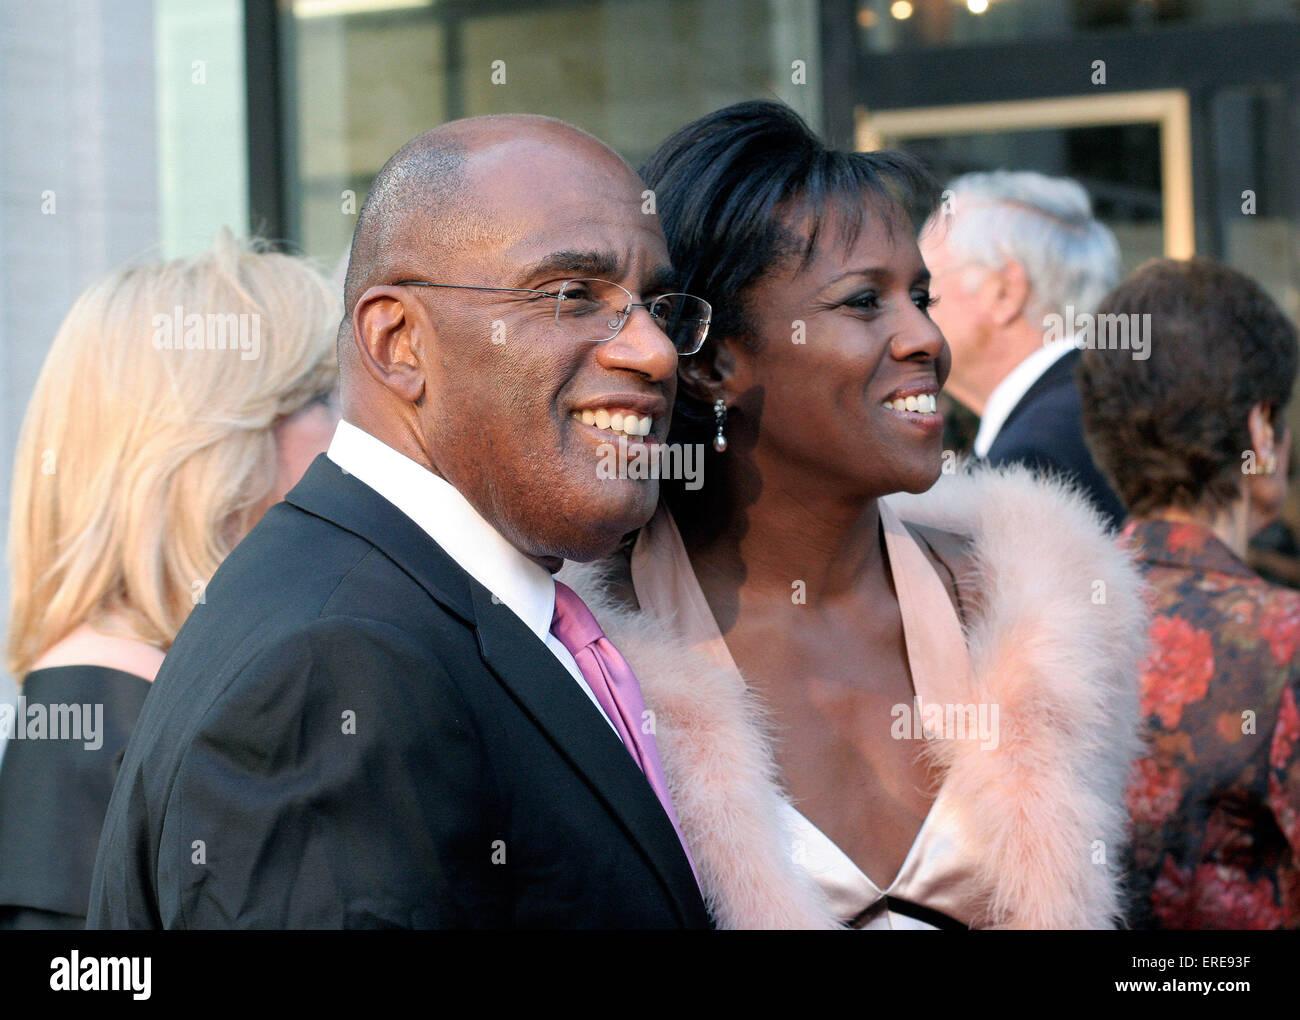 Al Roker With His Wife Deborah Roberts Attend The Metropolitan Opera Stock Photo Alamy